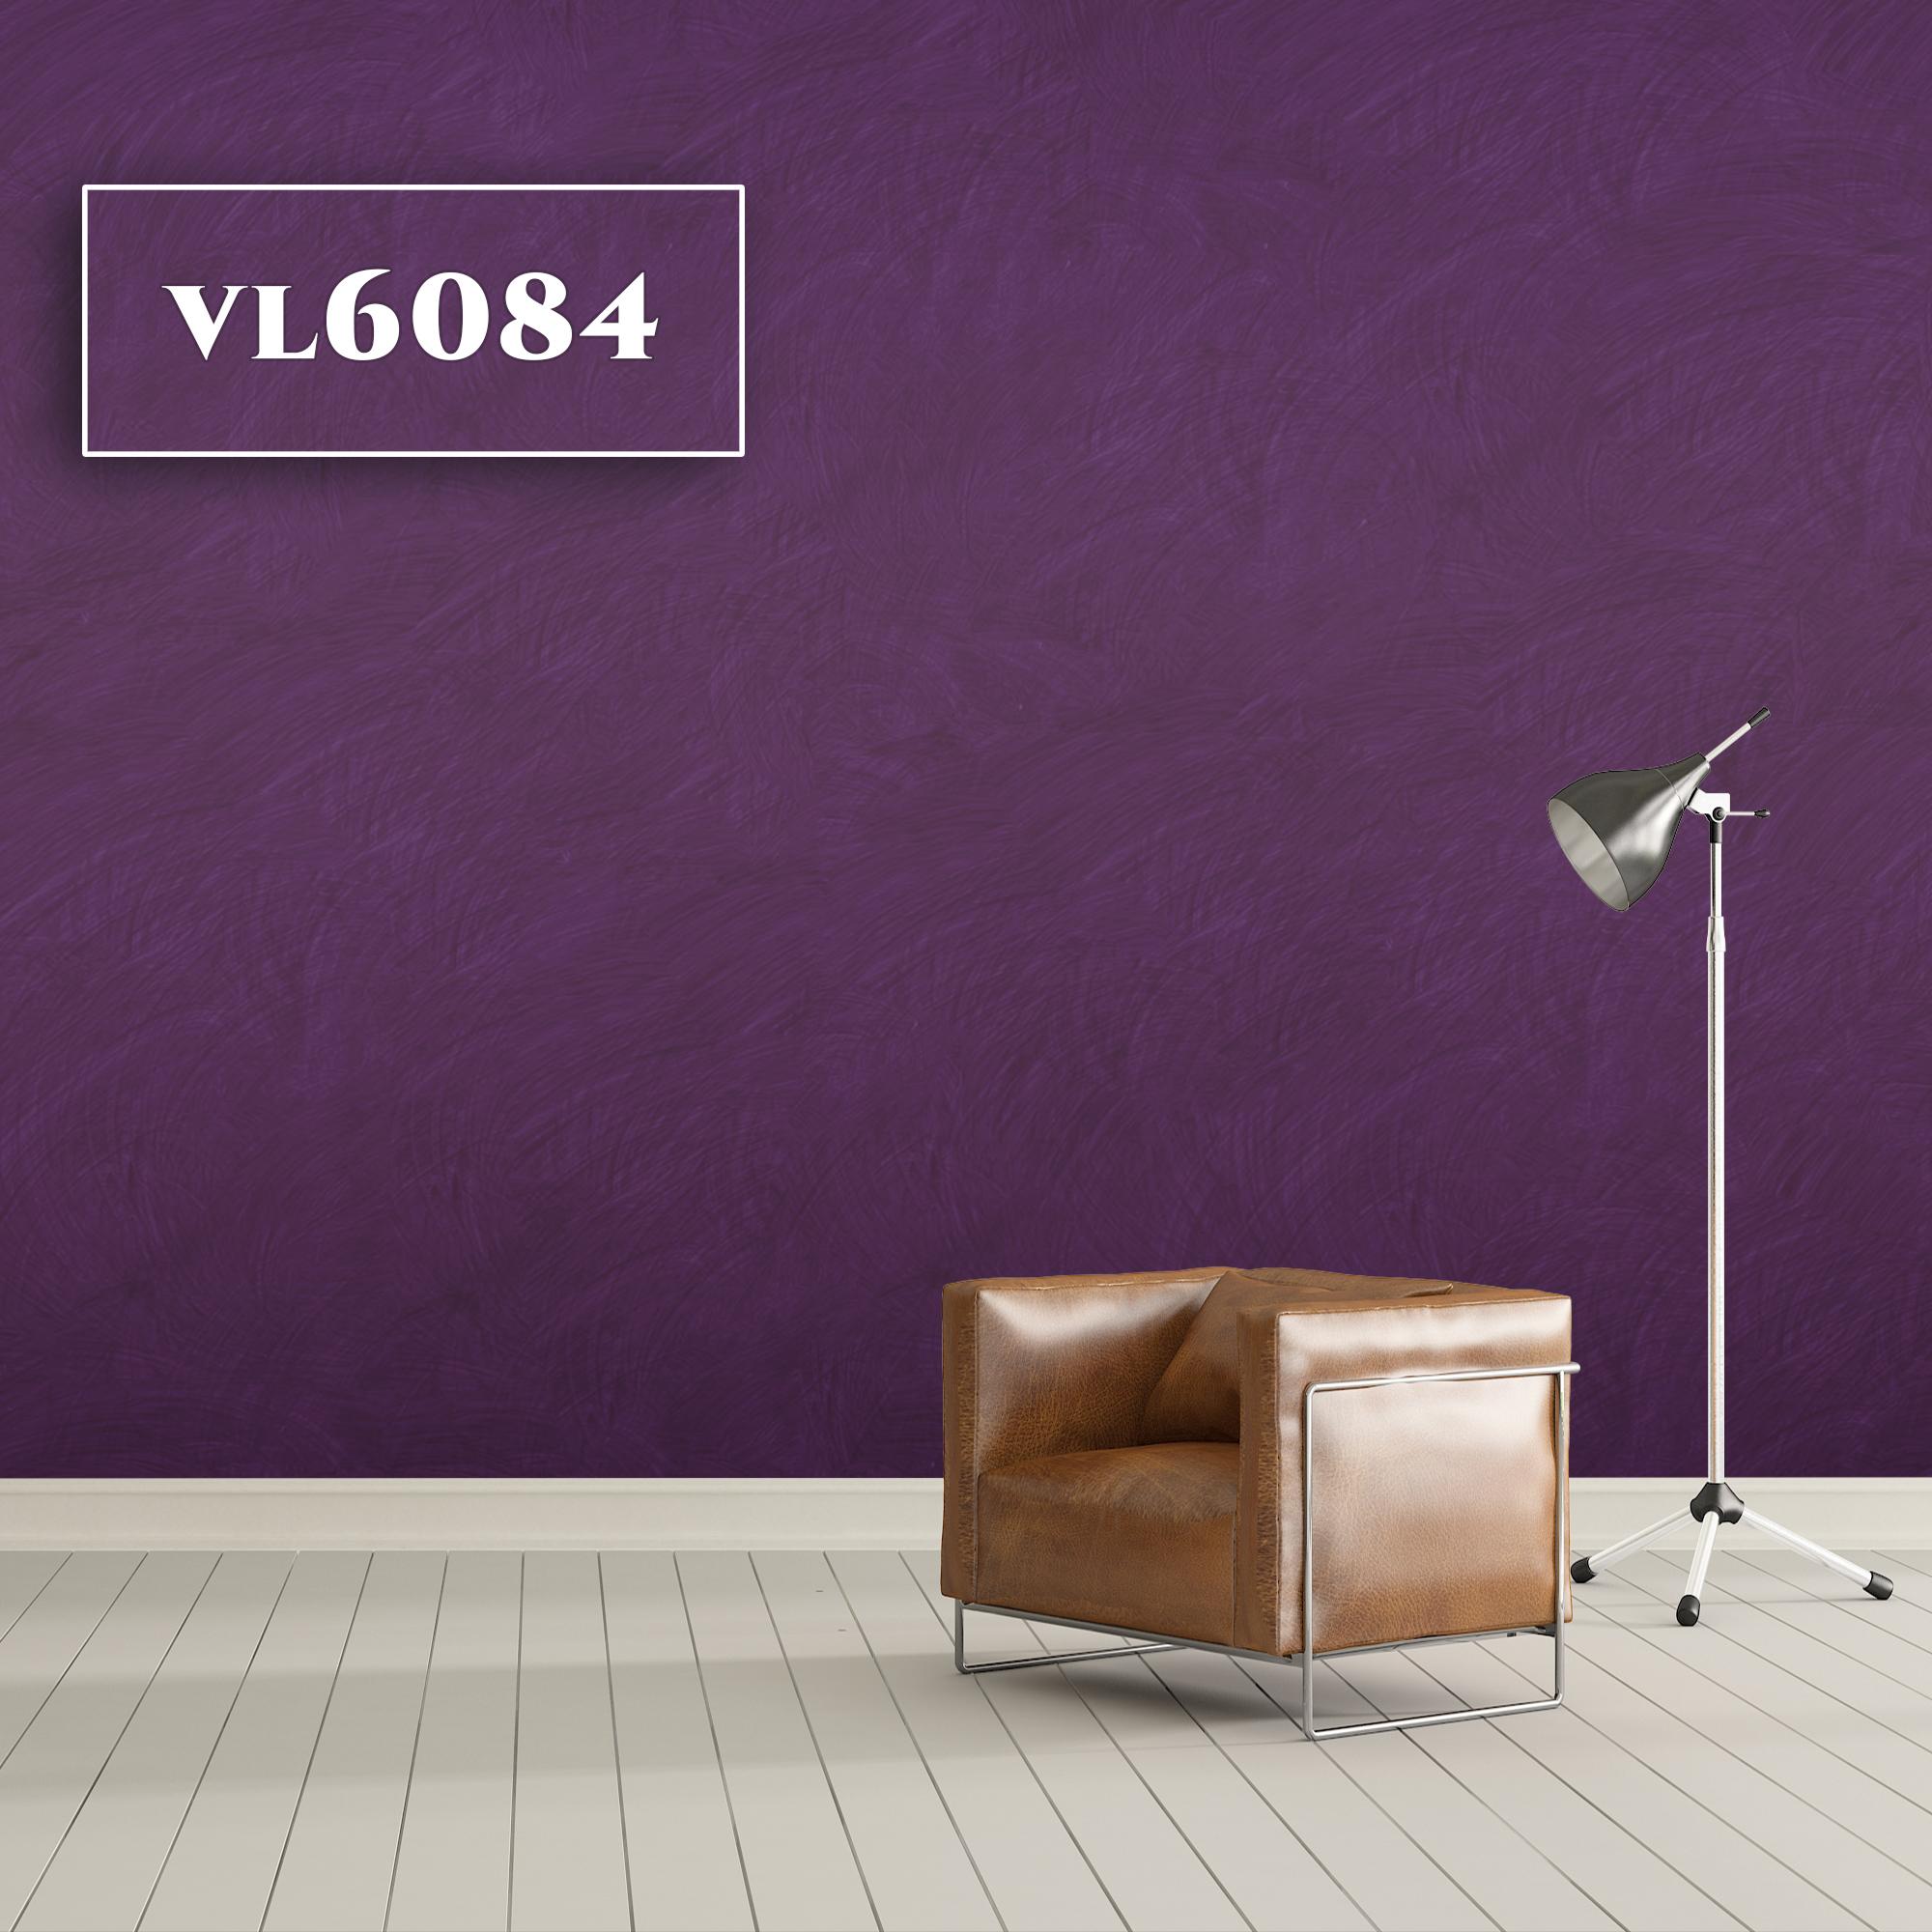 VL6084